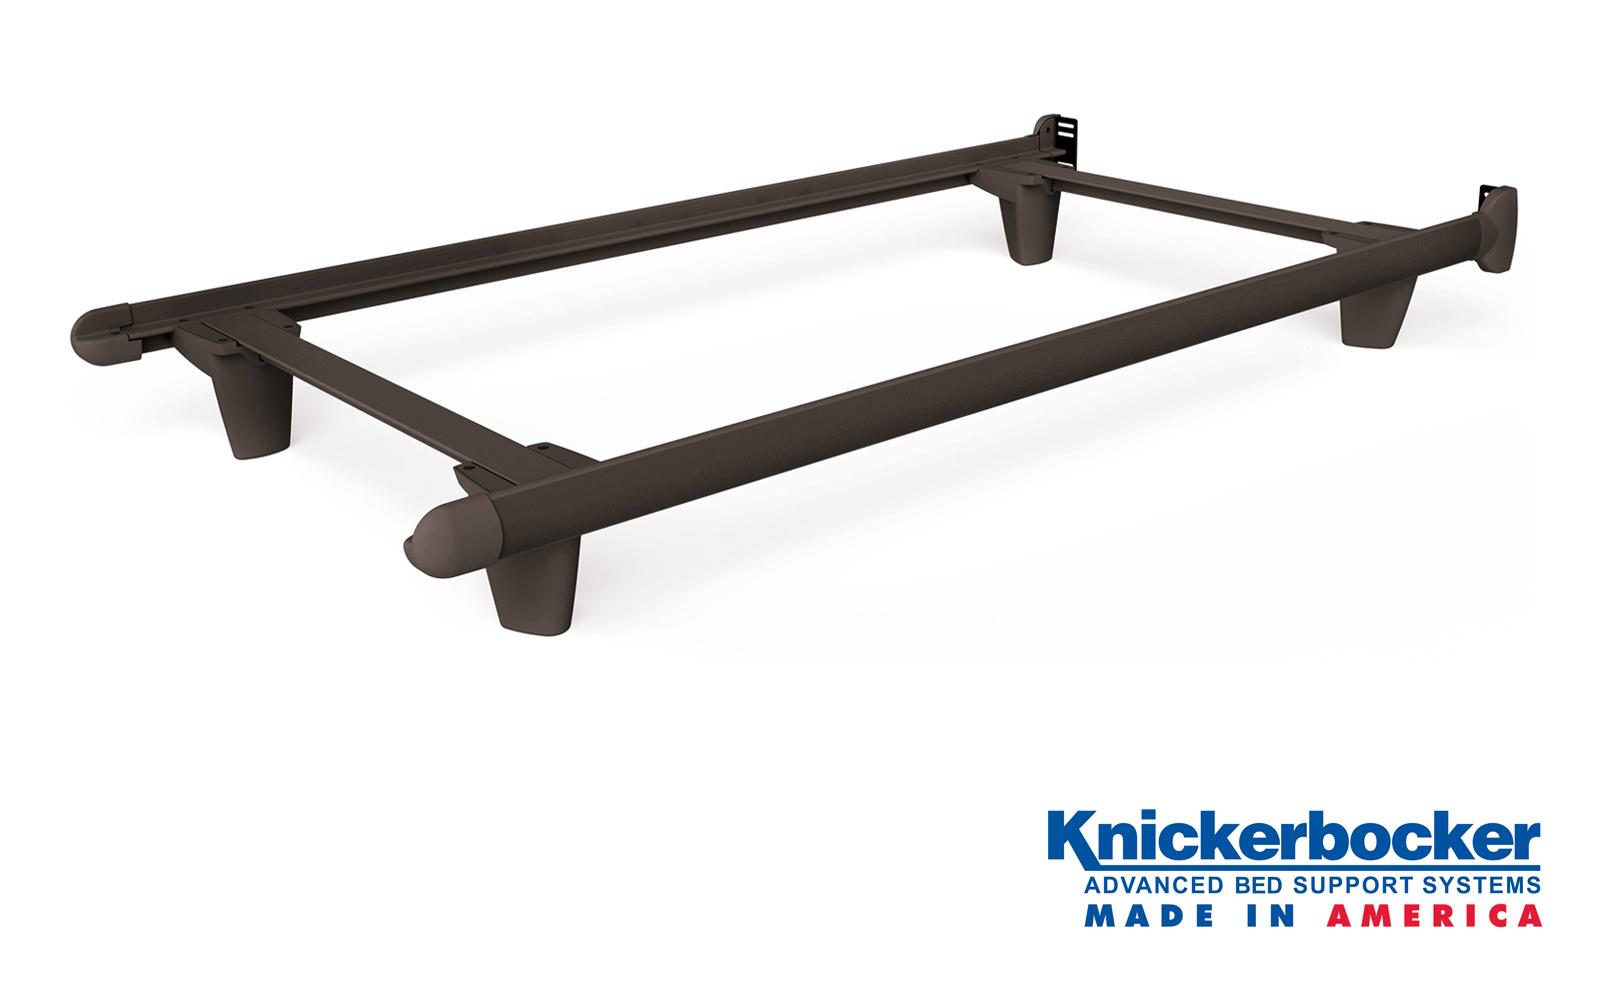 Knickerbocker Bed Frame Company